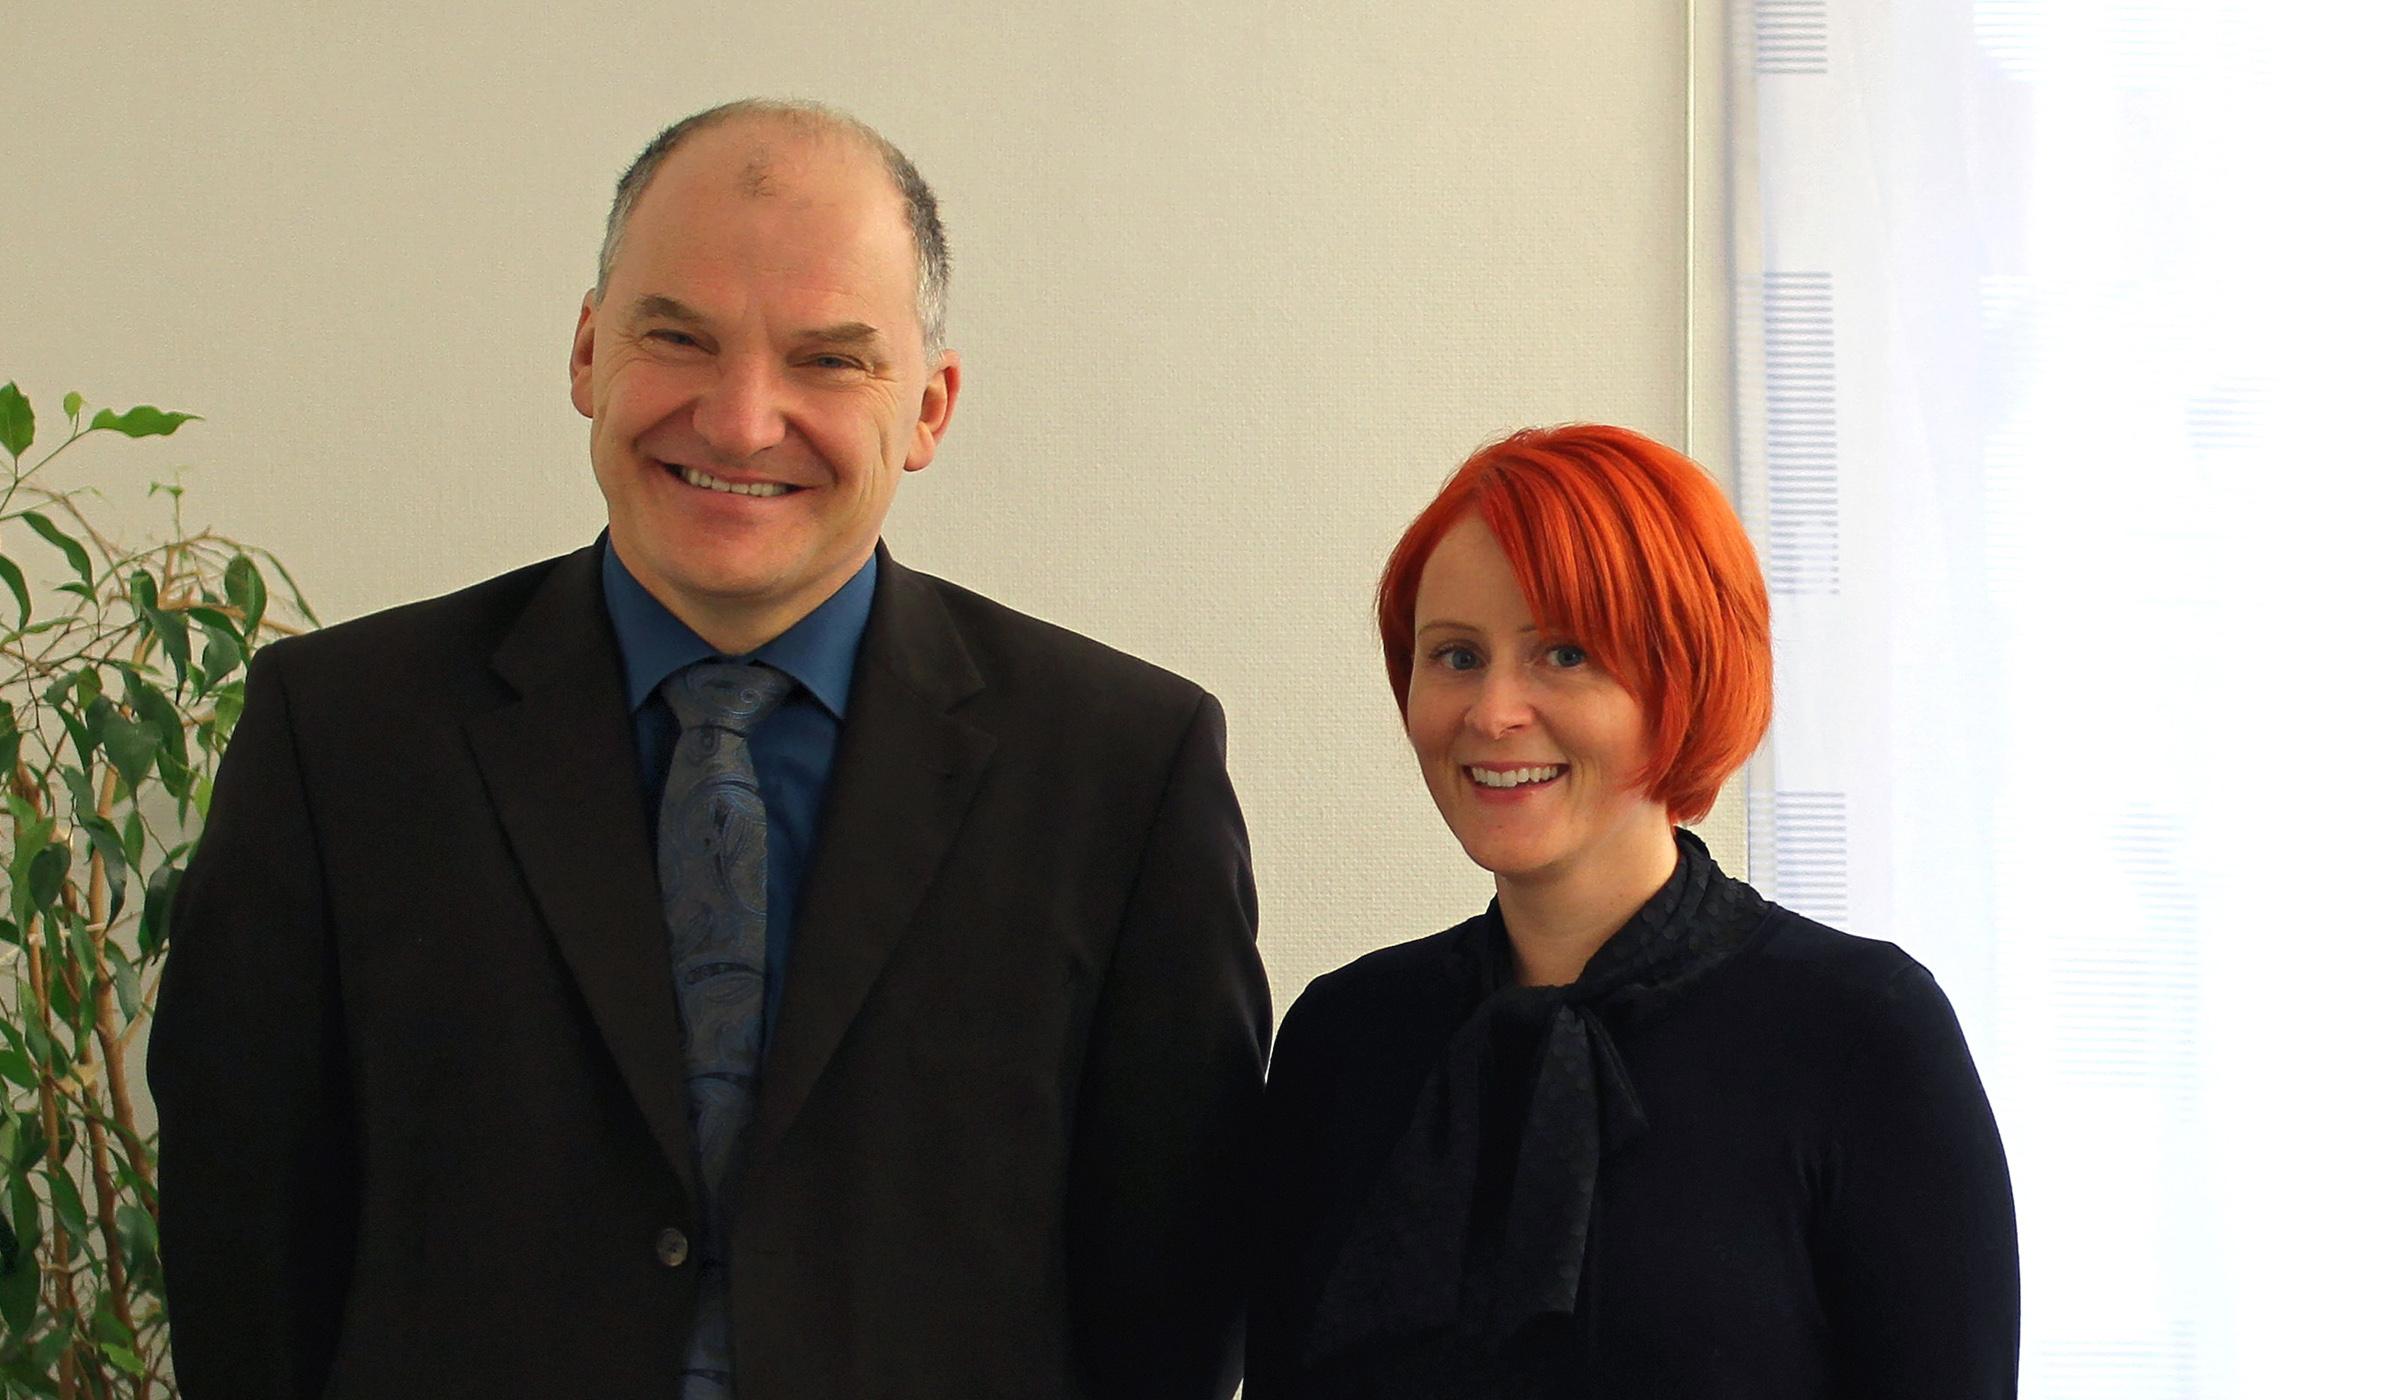 Rechtsanwältin Manuela Frick-Biber und Rechtsanwalt Guntram Marx